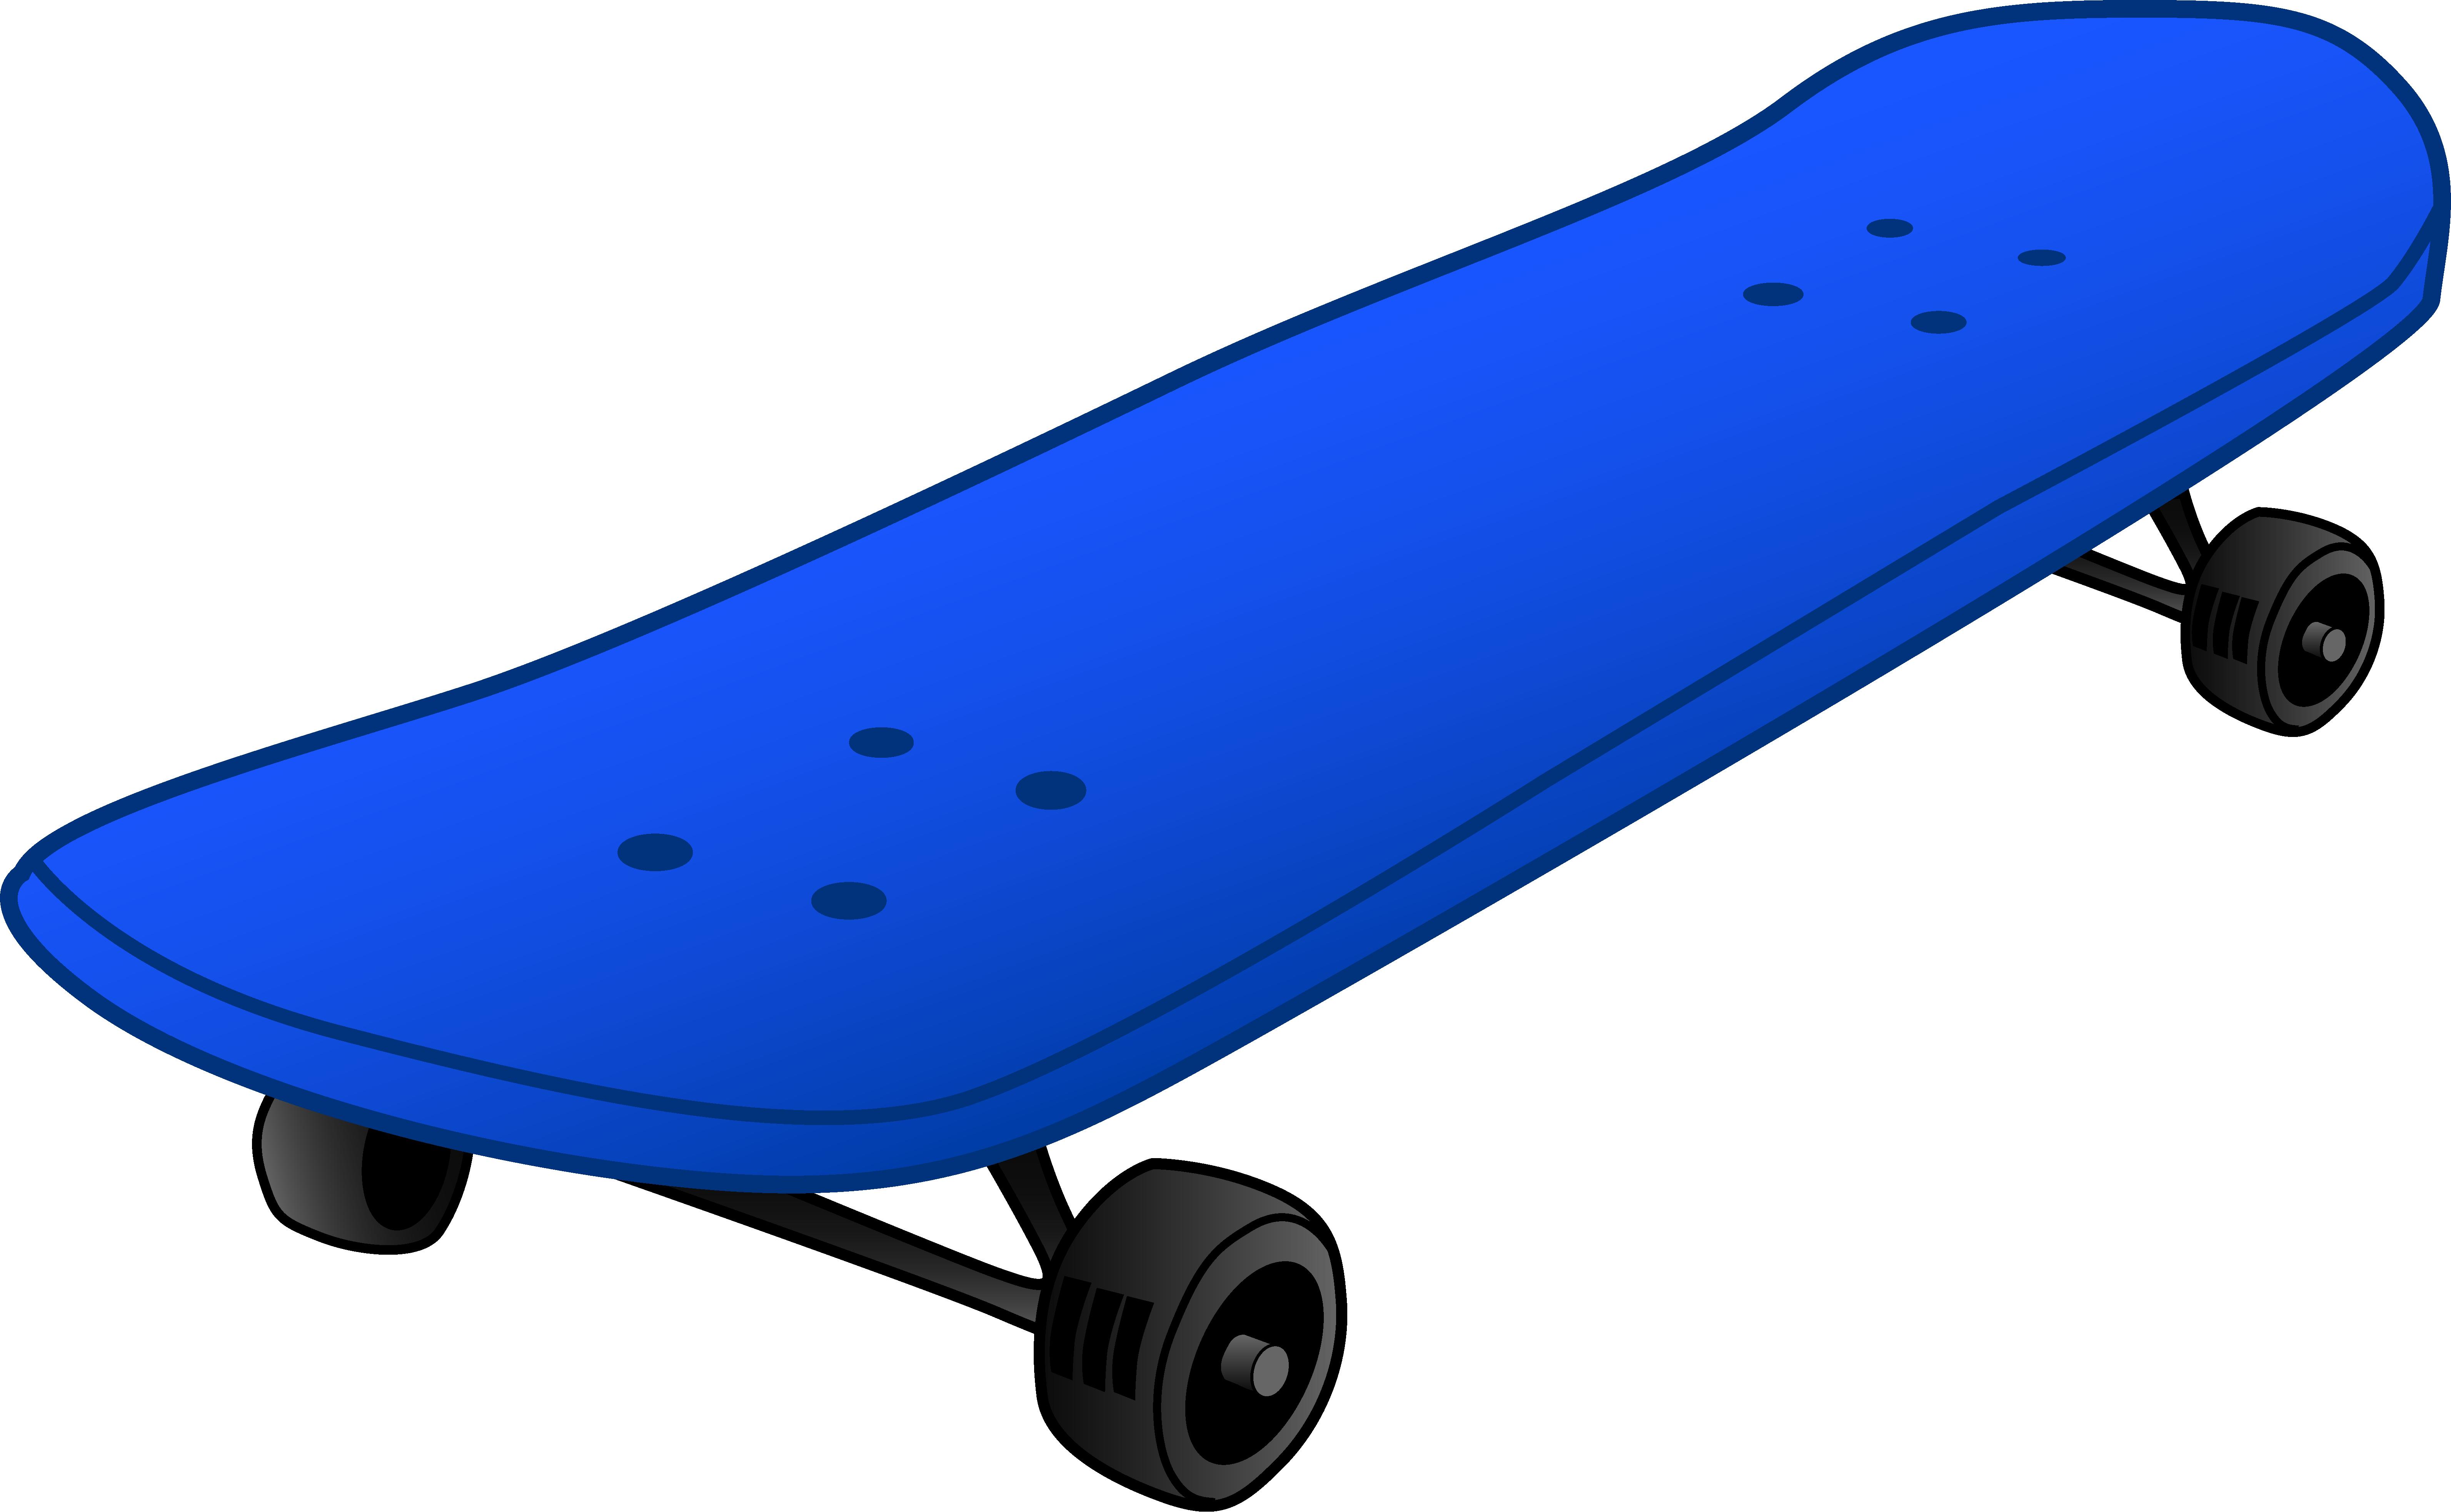 Skateboard Clip Art Borders | Clipart Panda - Free Clipart Images